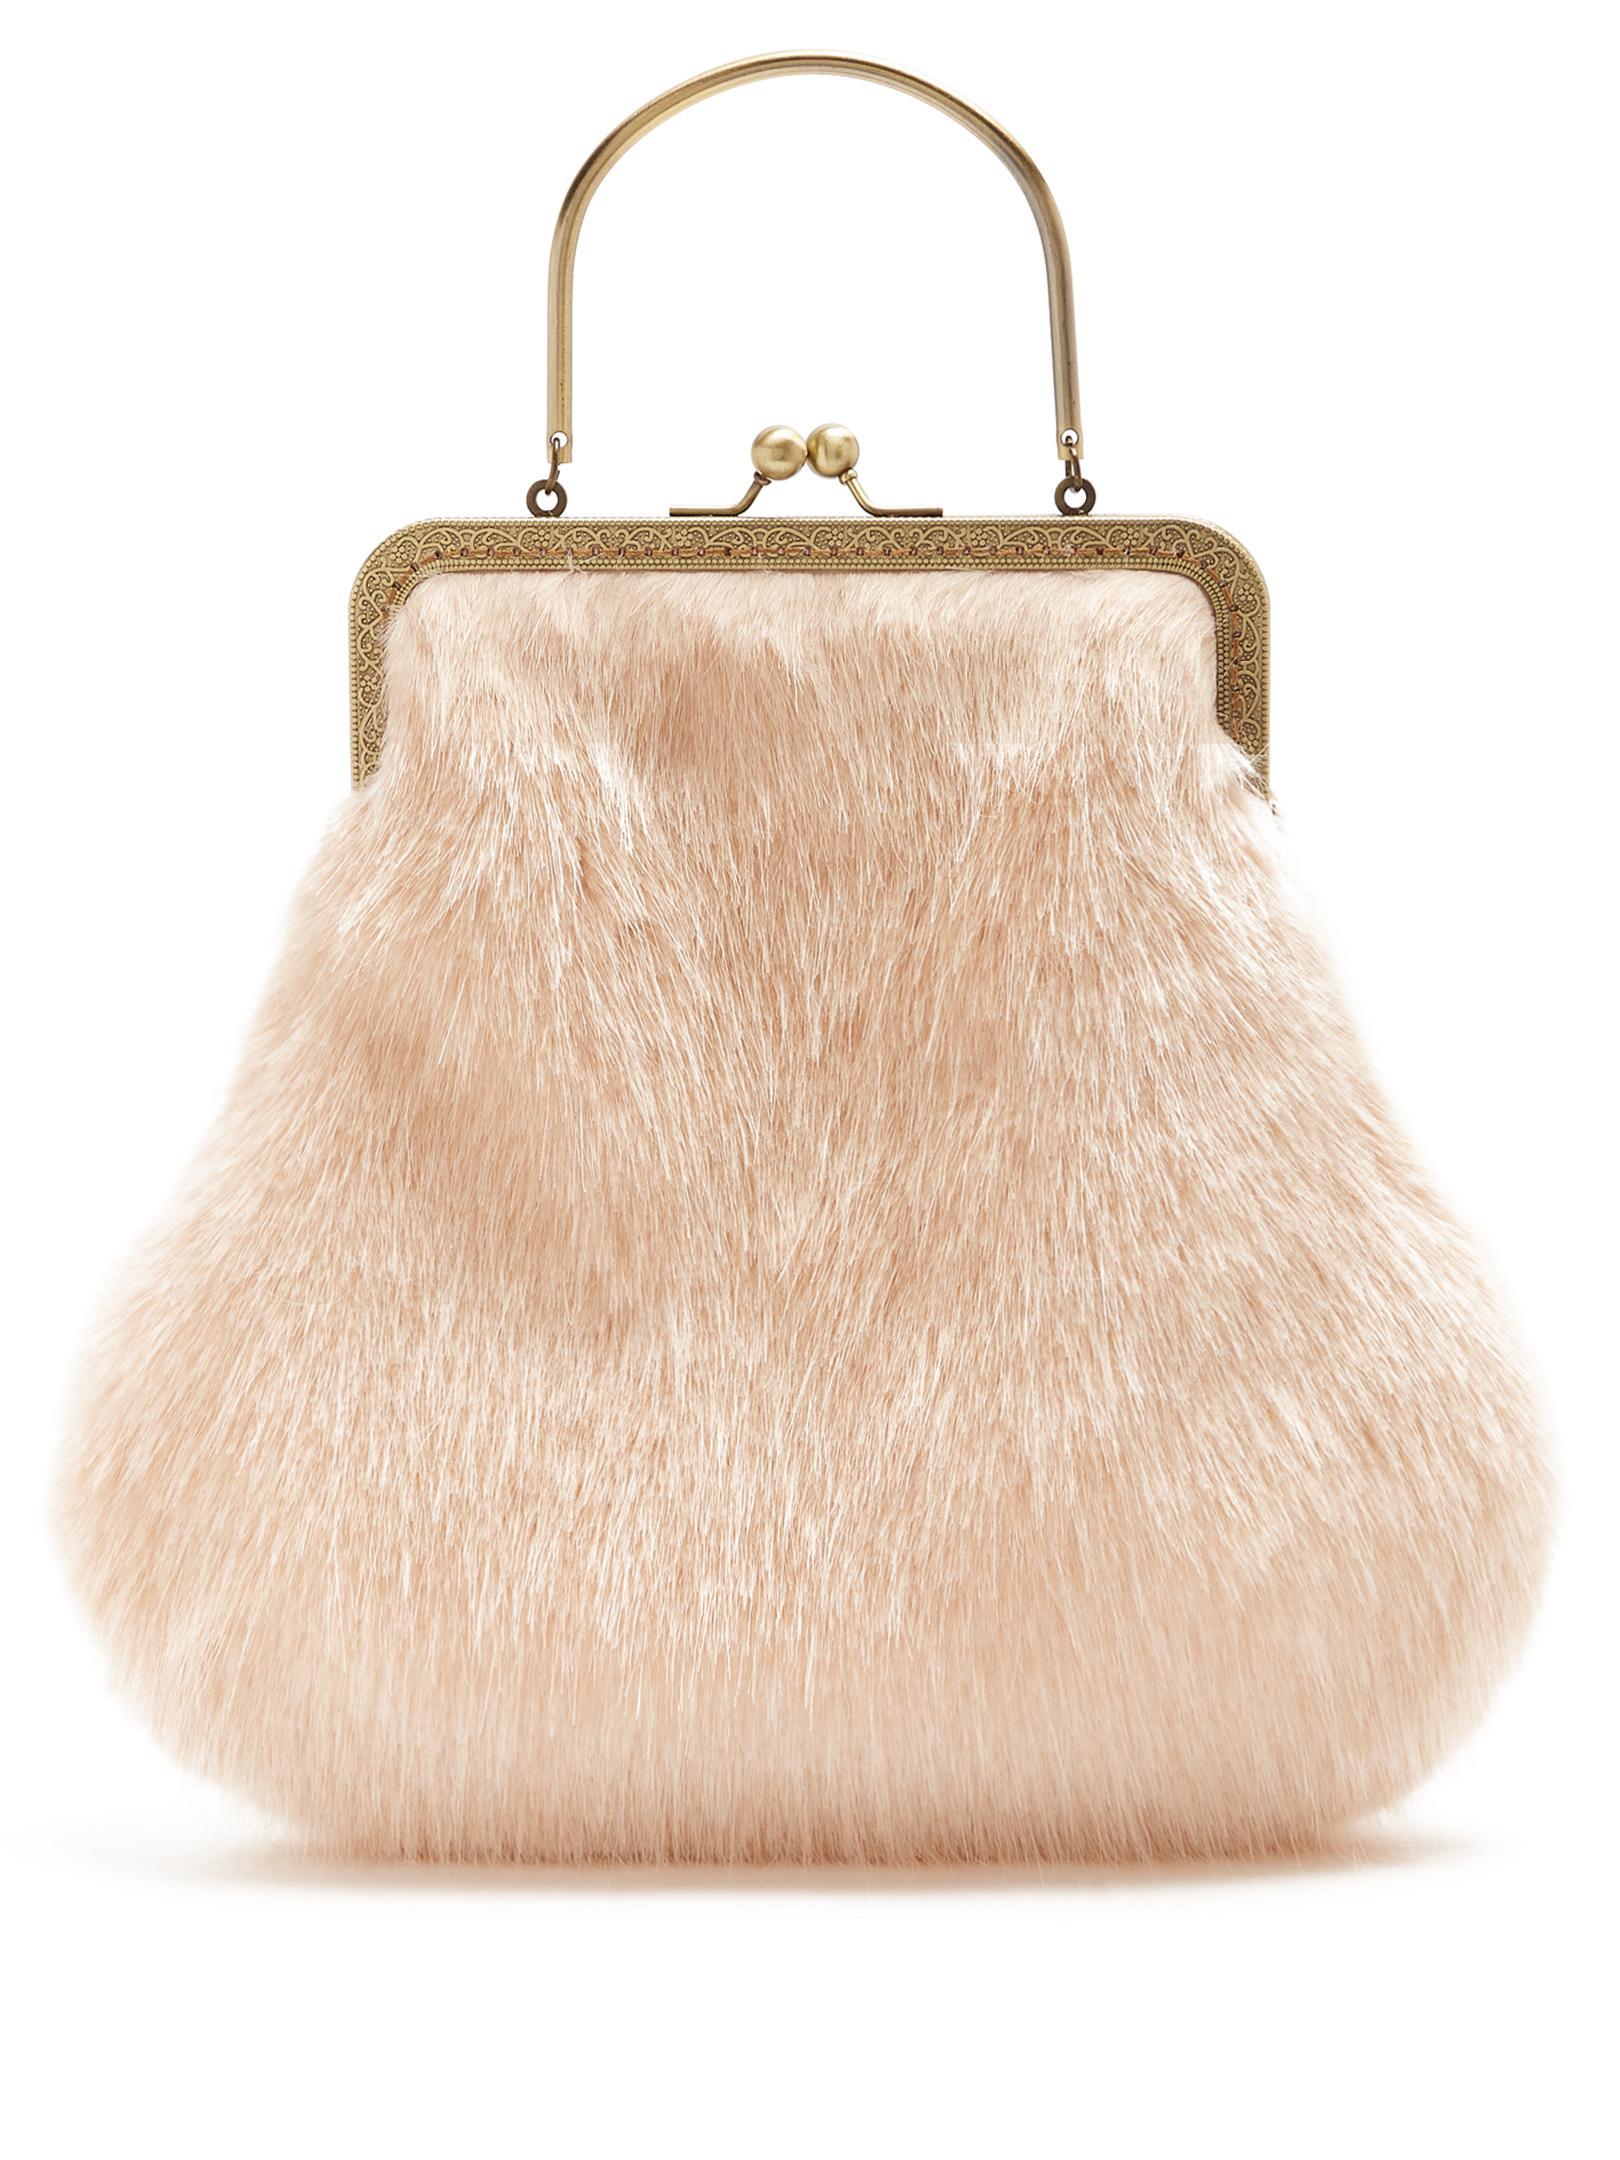 Shrimps Arthur Faux-fur Bag in Pink - Lyst 2dec1d9825c9a